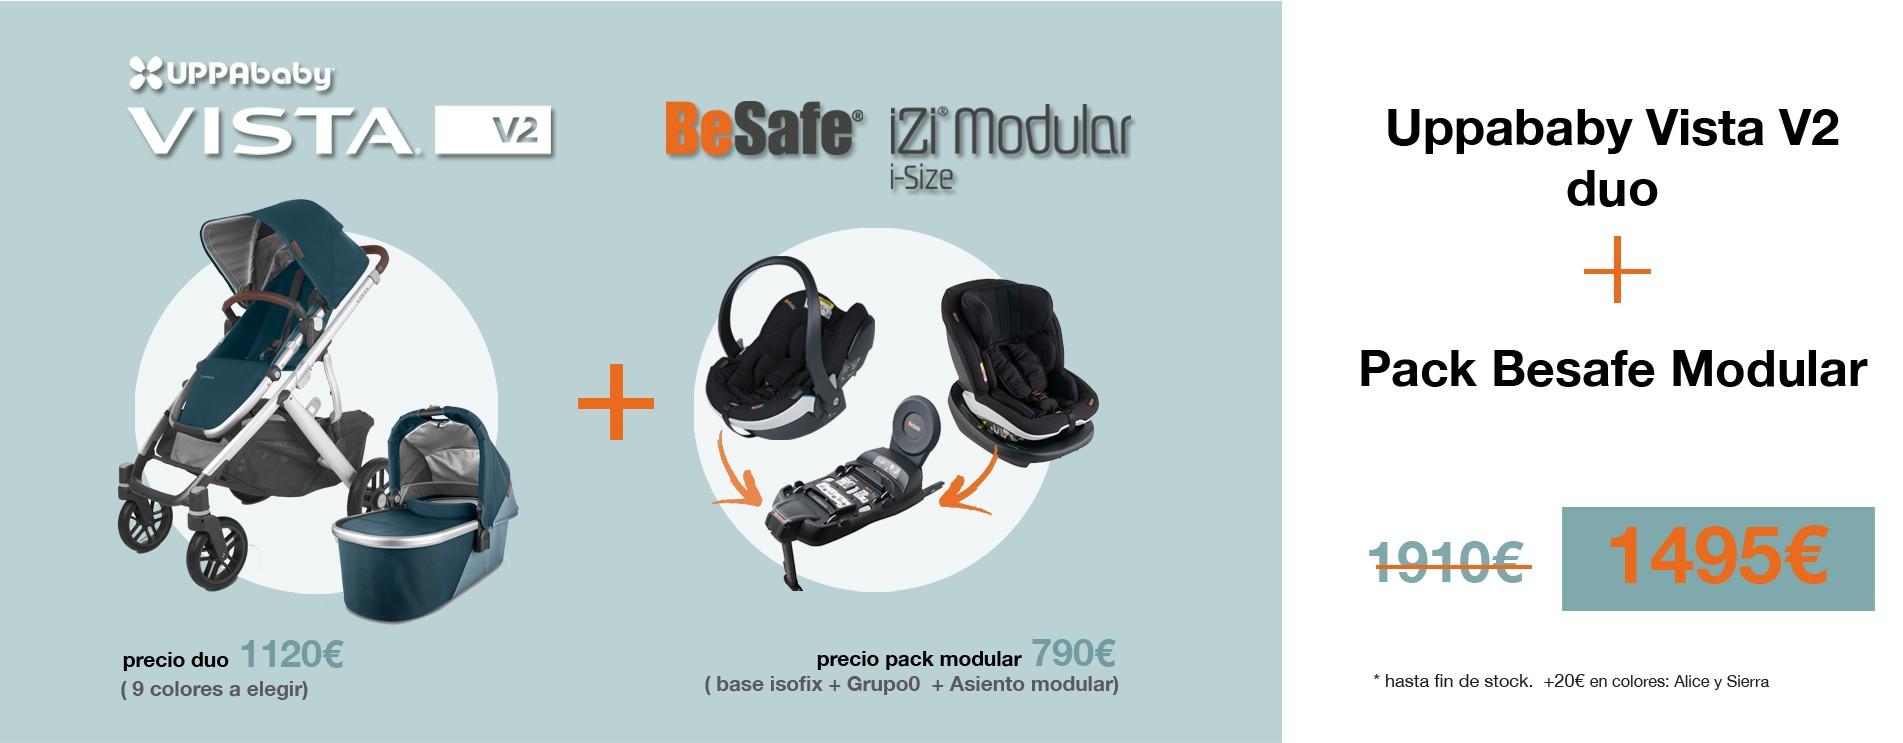 Promo Uppababy Vista + Besafe Modular